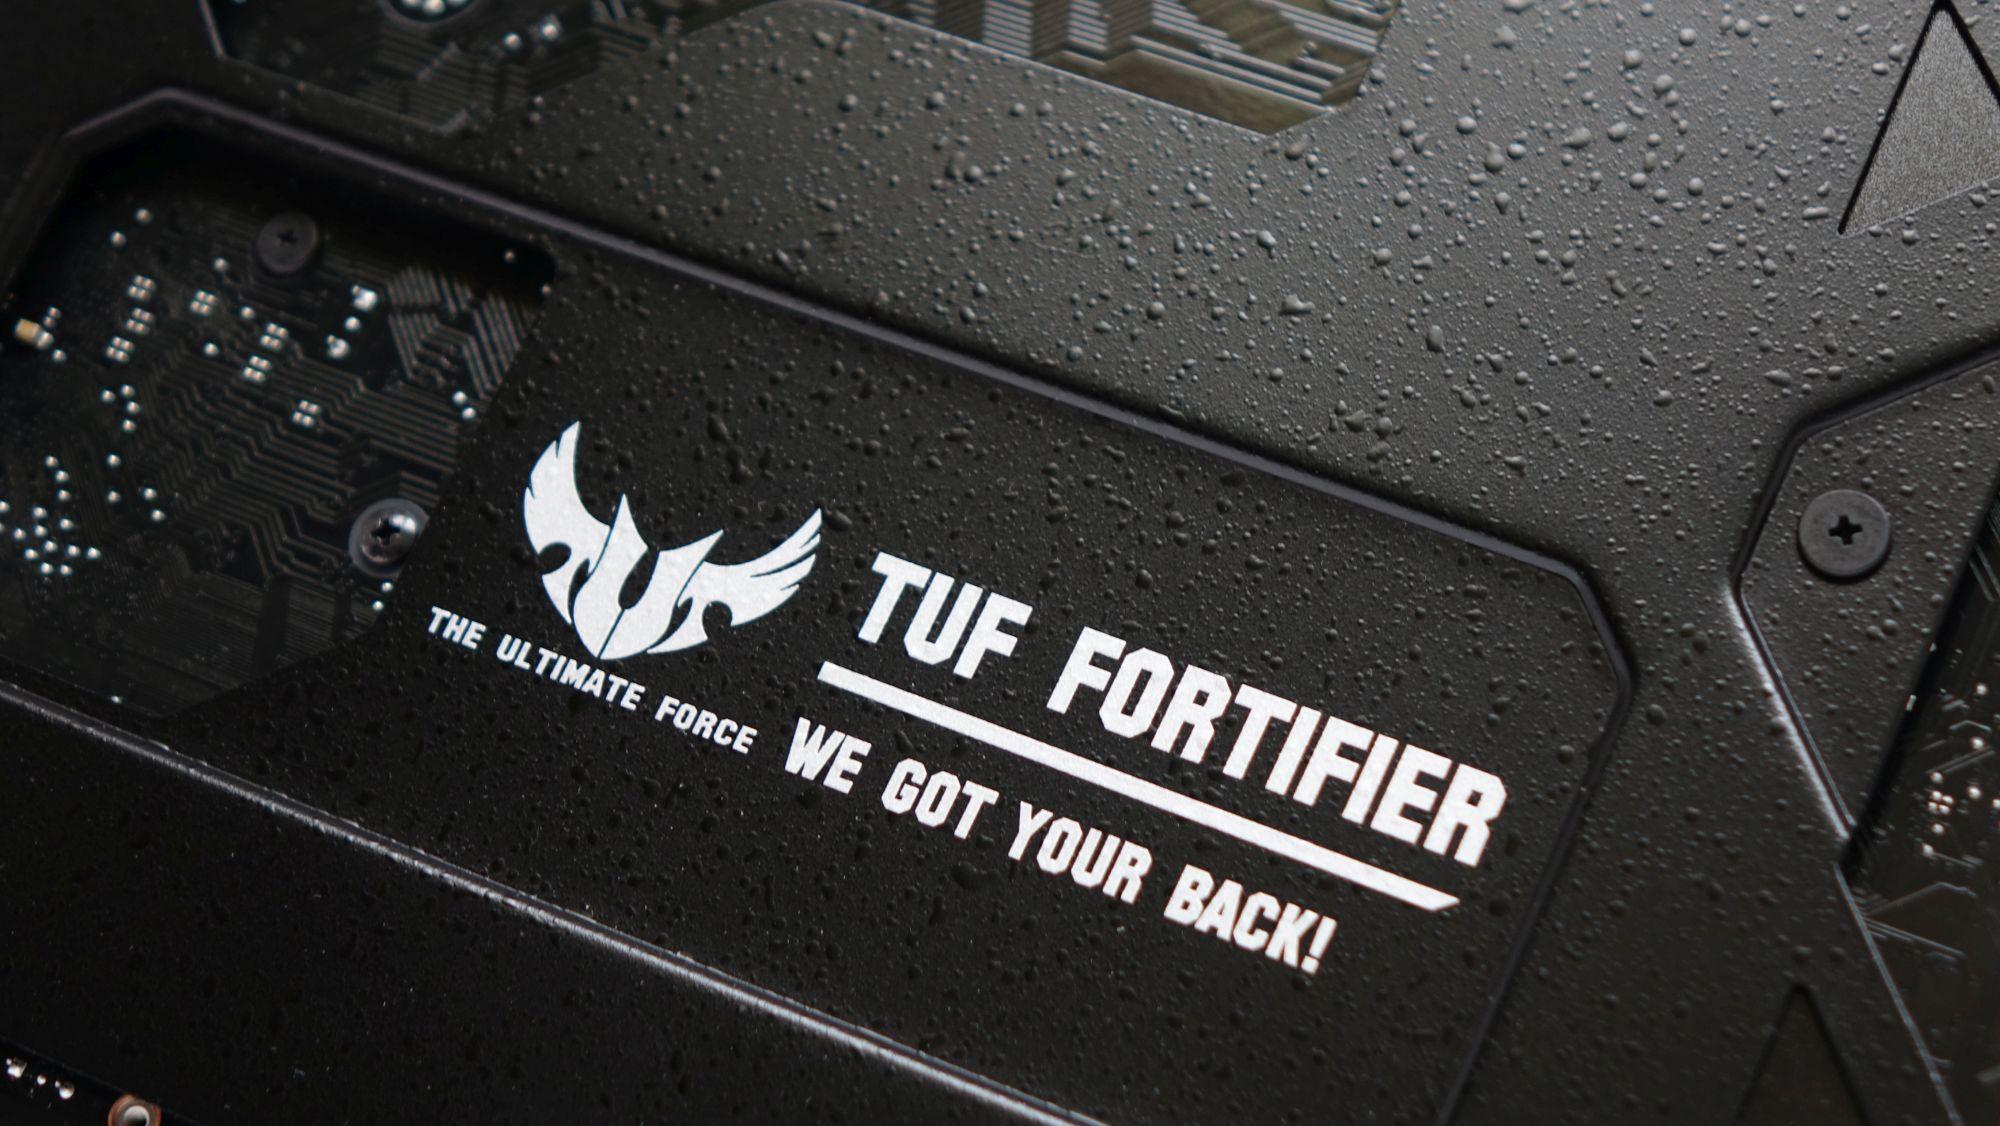 ASUS TUF Z270 Mark 1 logo